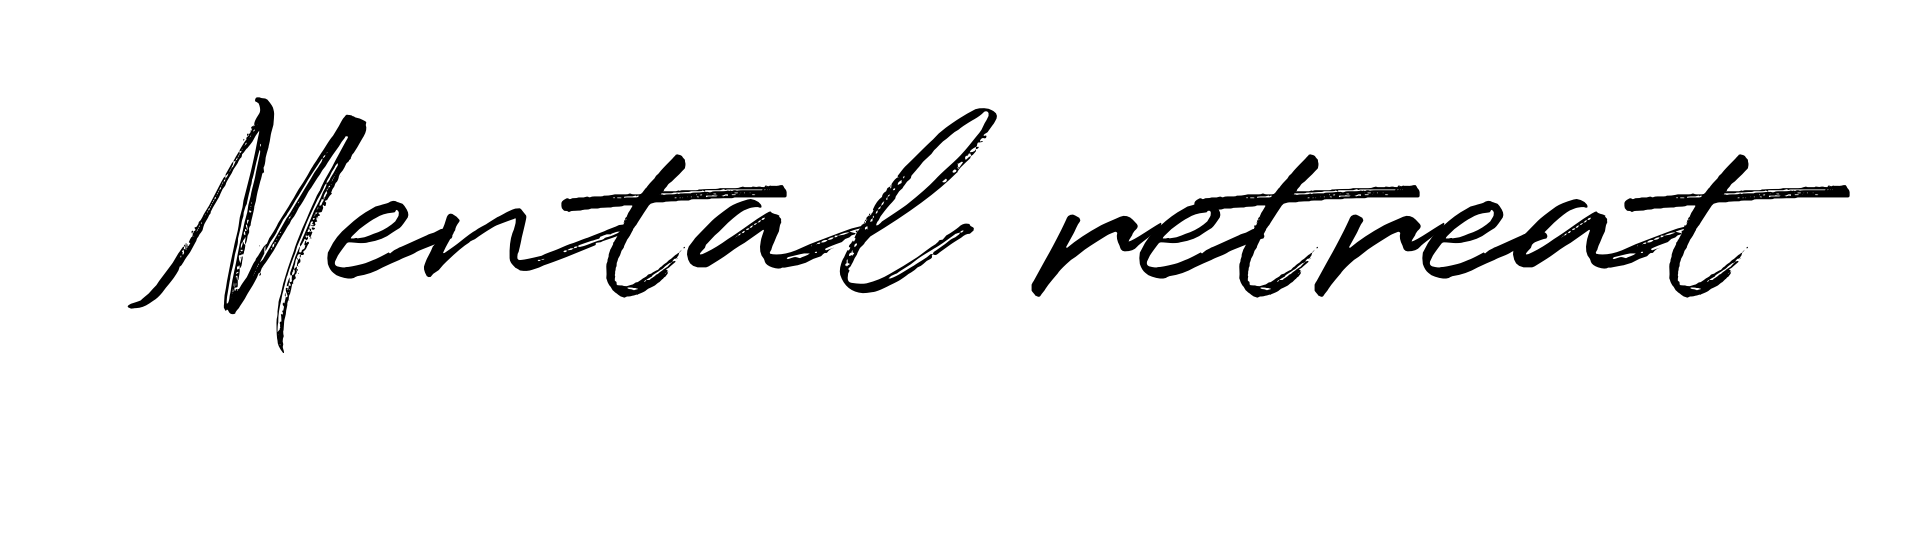 hacomono